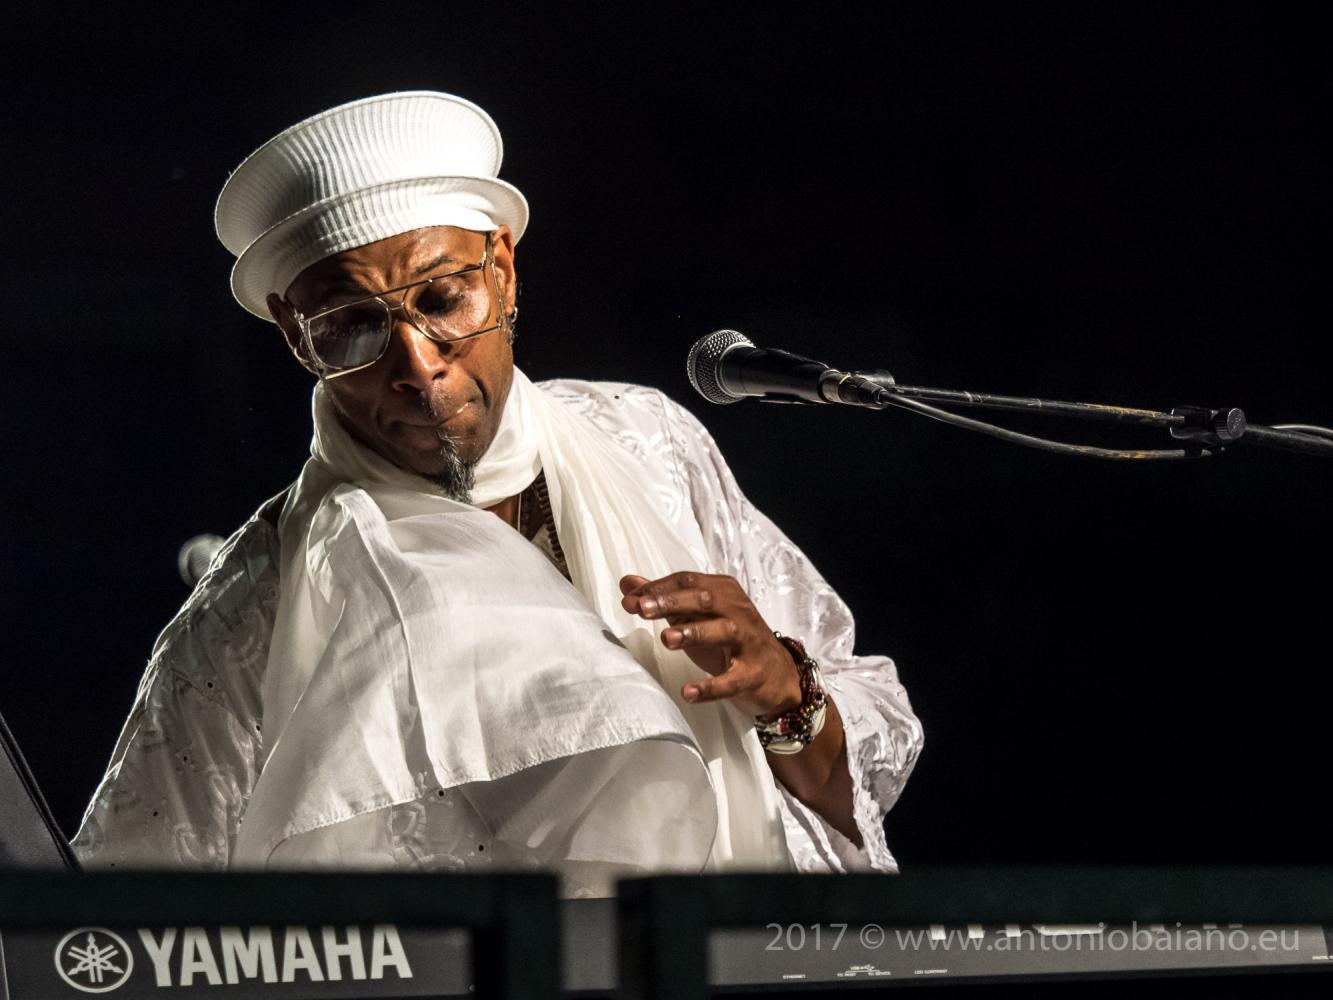 Omar Sosa - Omar Sosa Quarteto AfroCubano